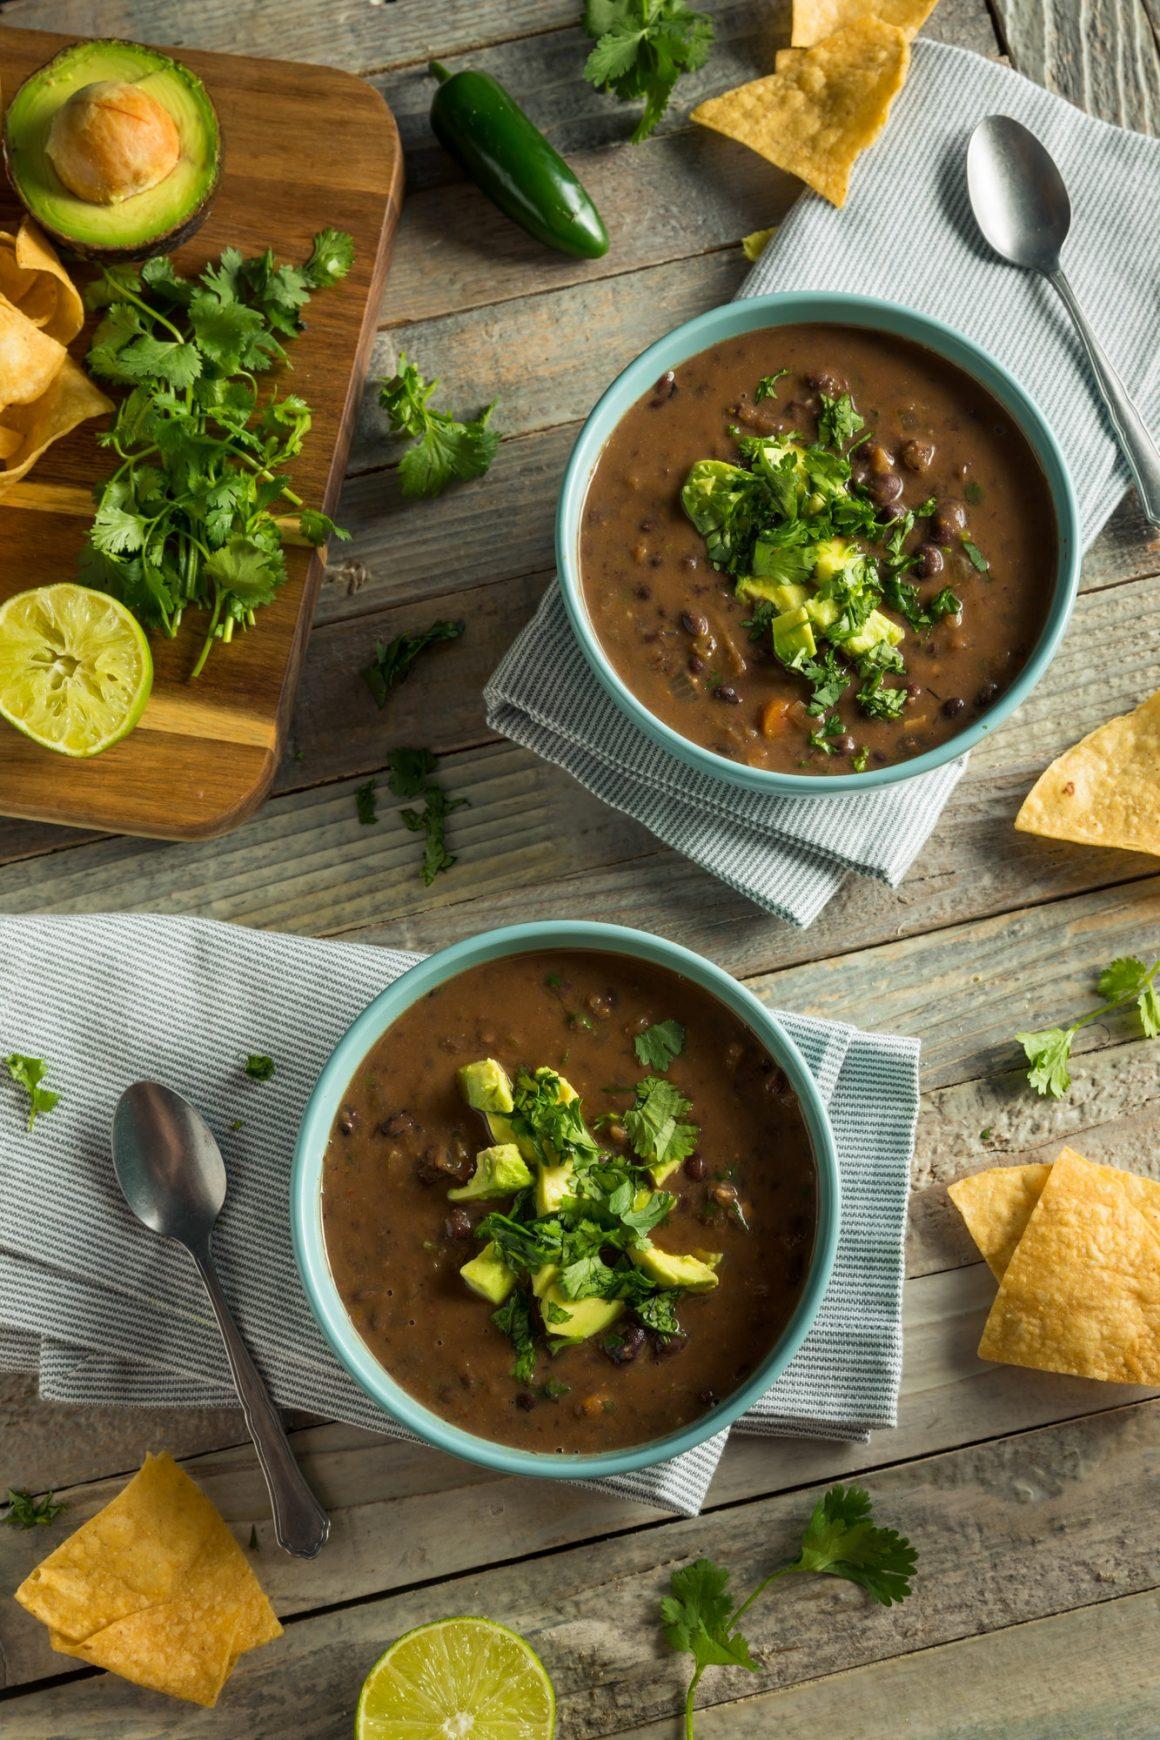 Fresh Homemade Black Bean Soup